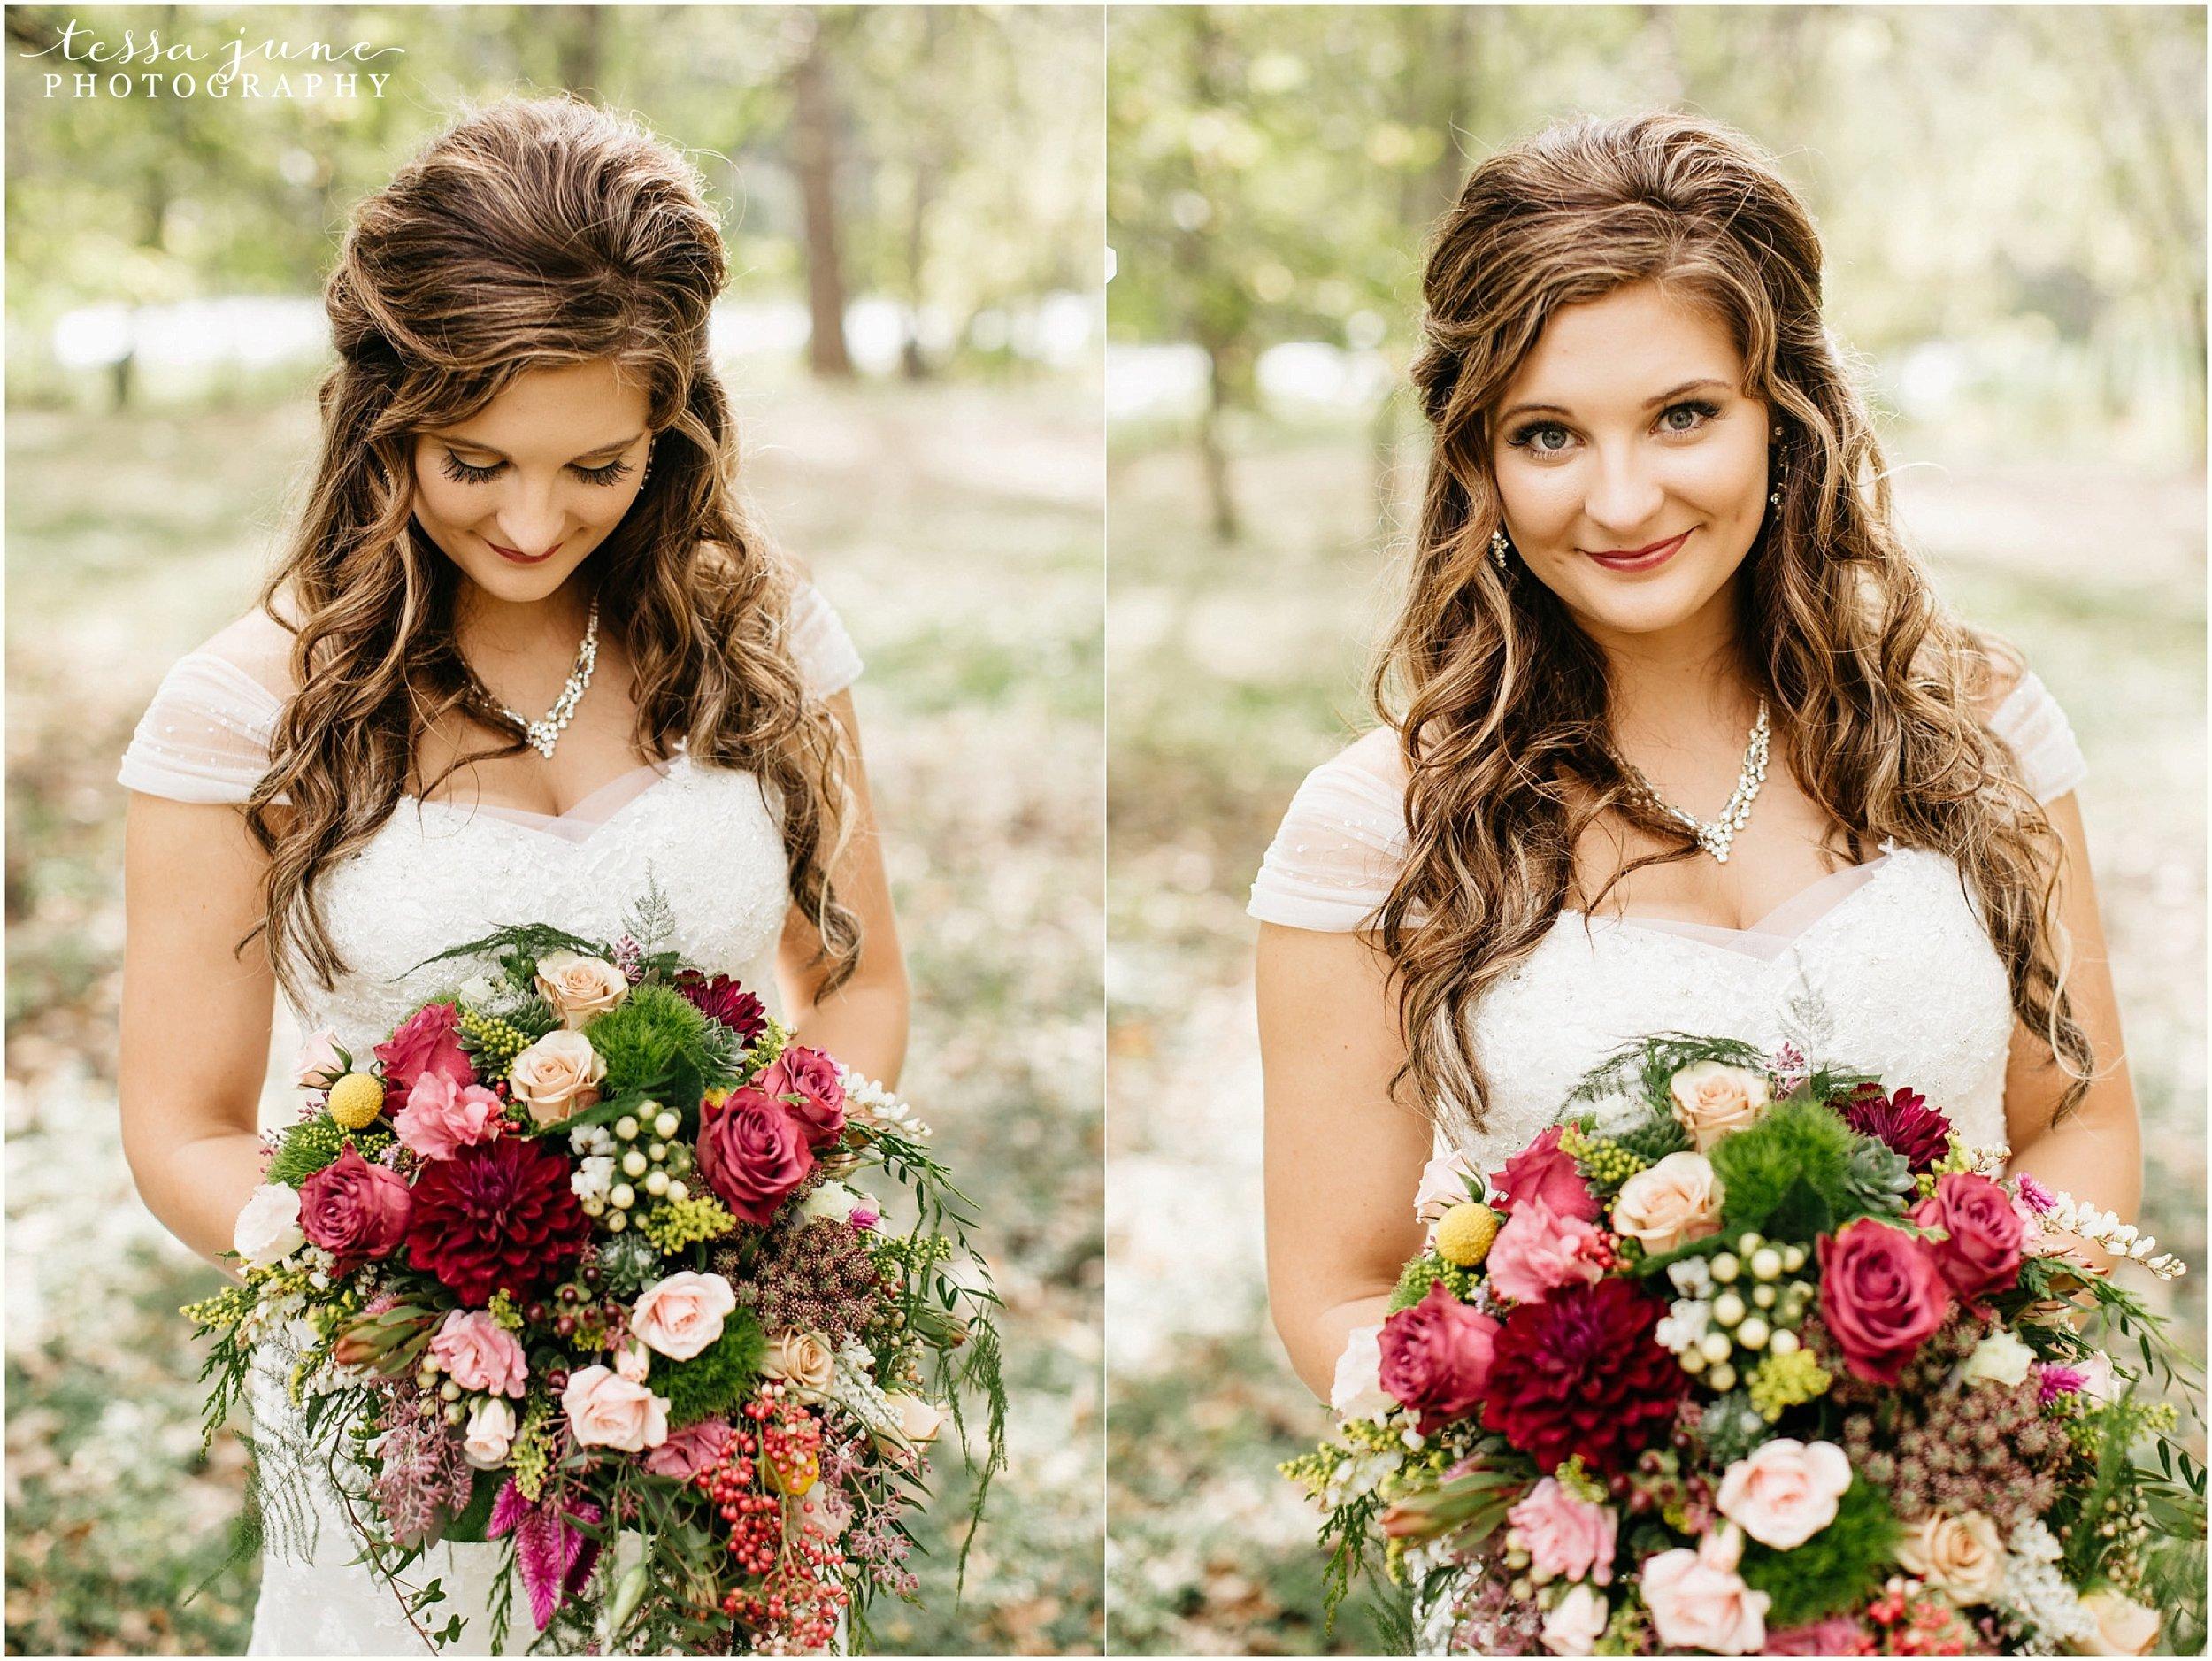 bohemian-minnesota-wedding-mismatched-bridesmaid-dresses-waterfall-st-cloud-tessa-june-photography-79.jpg